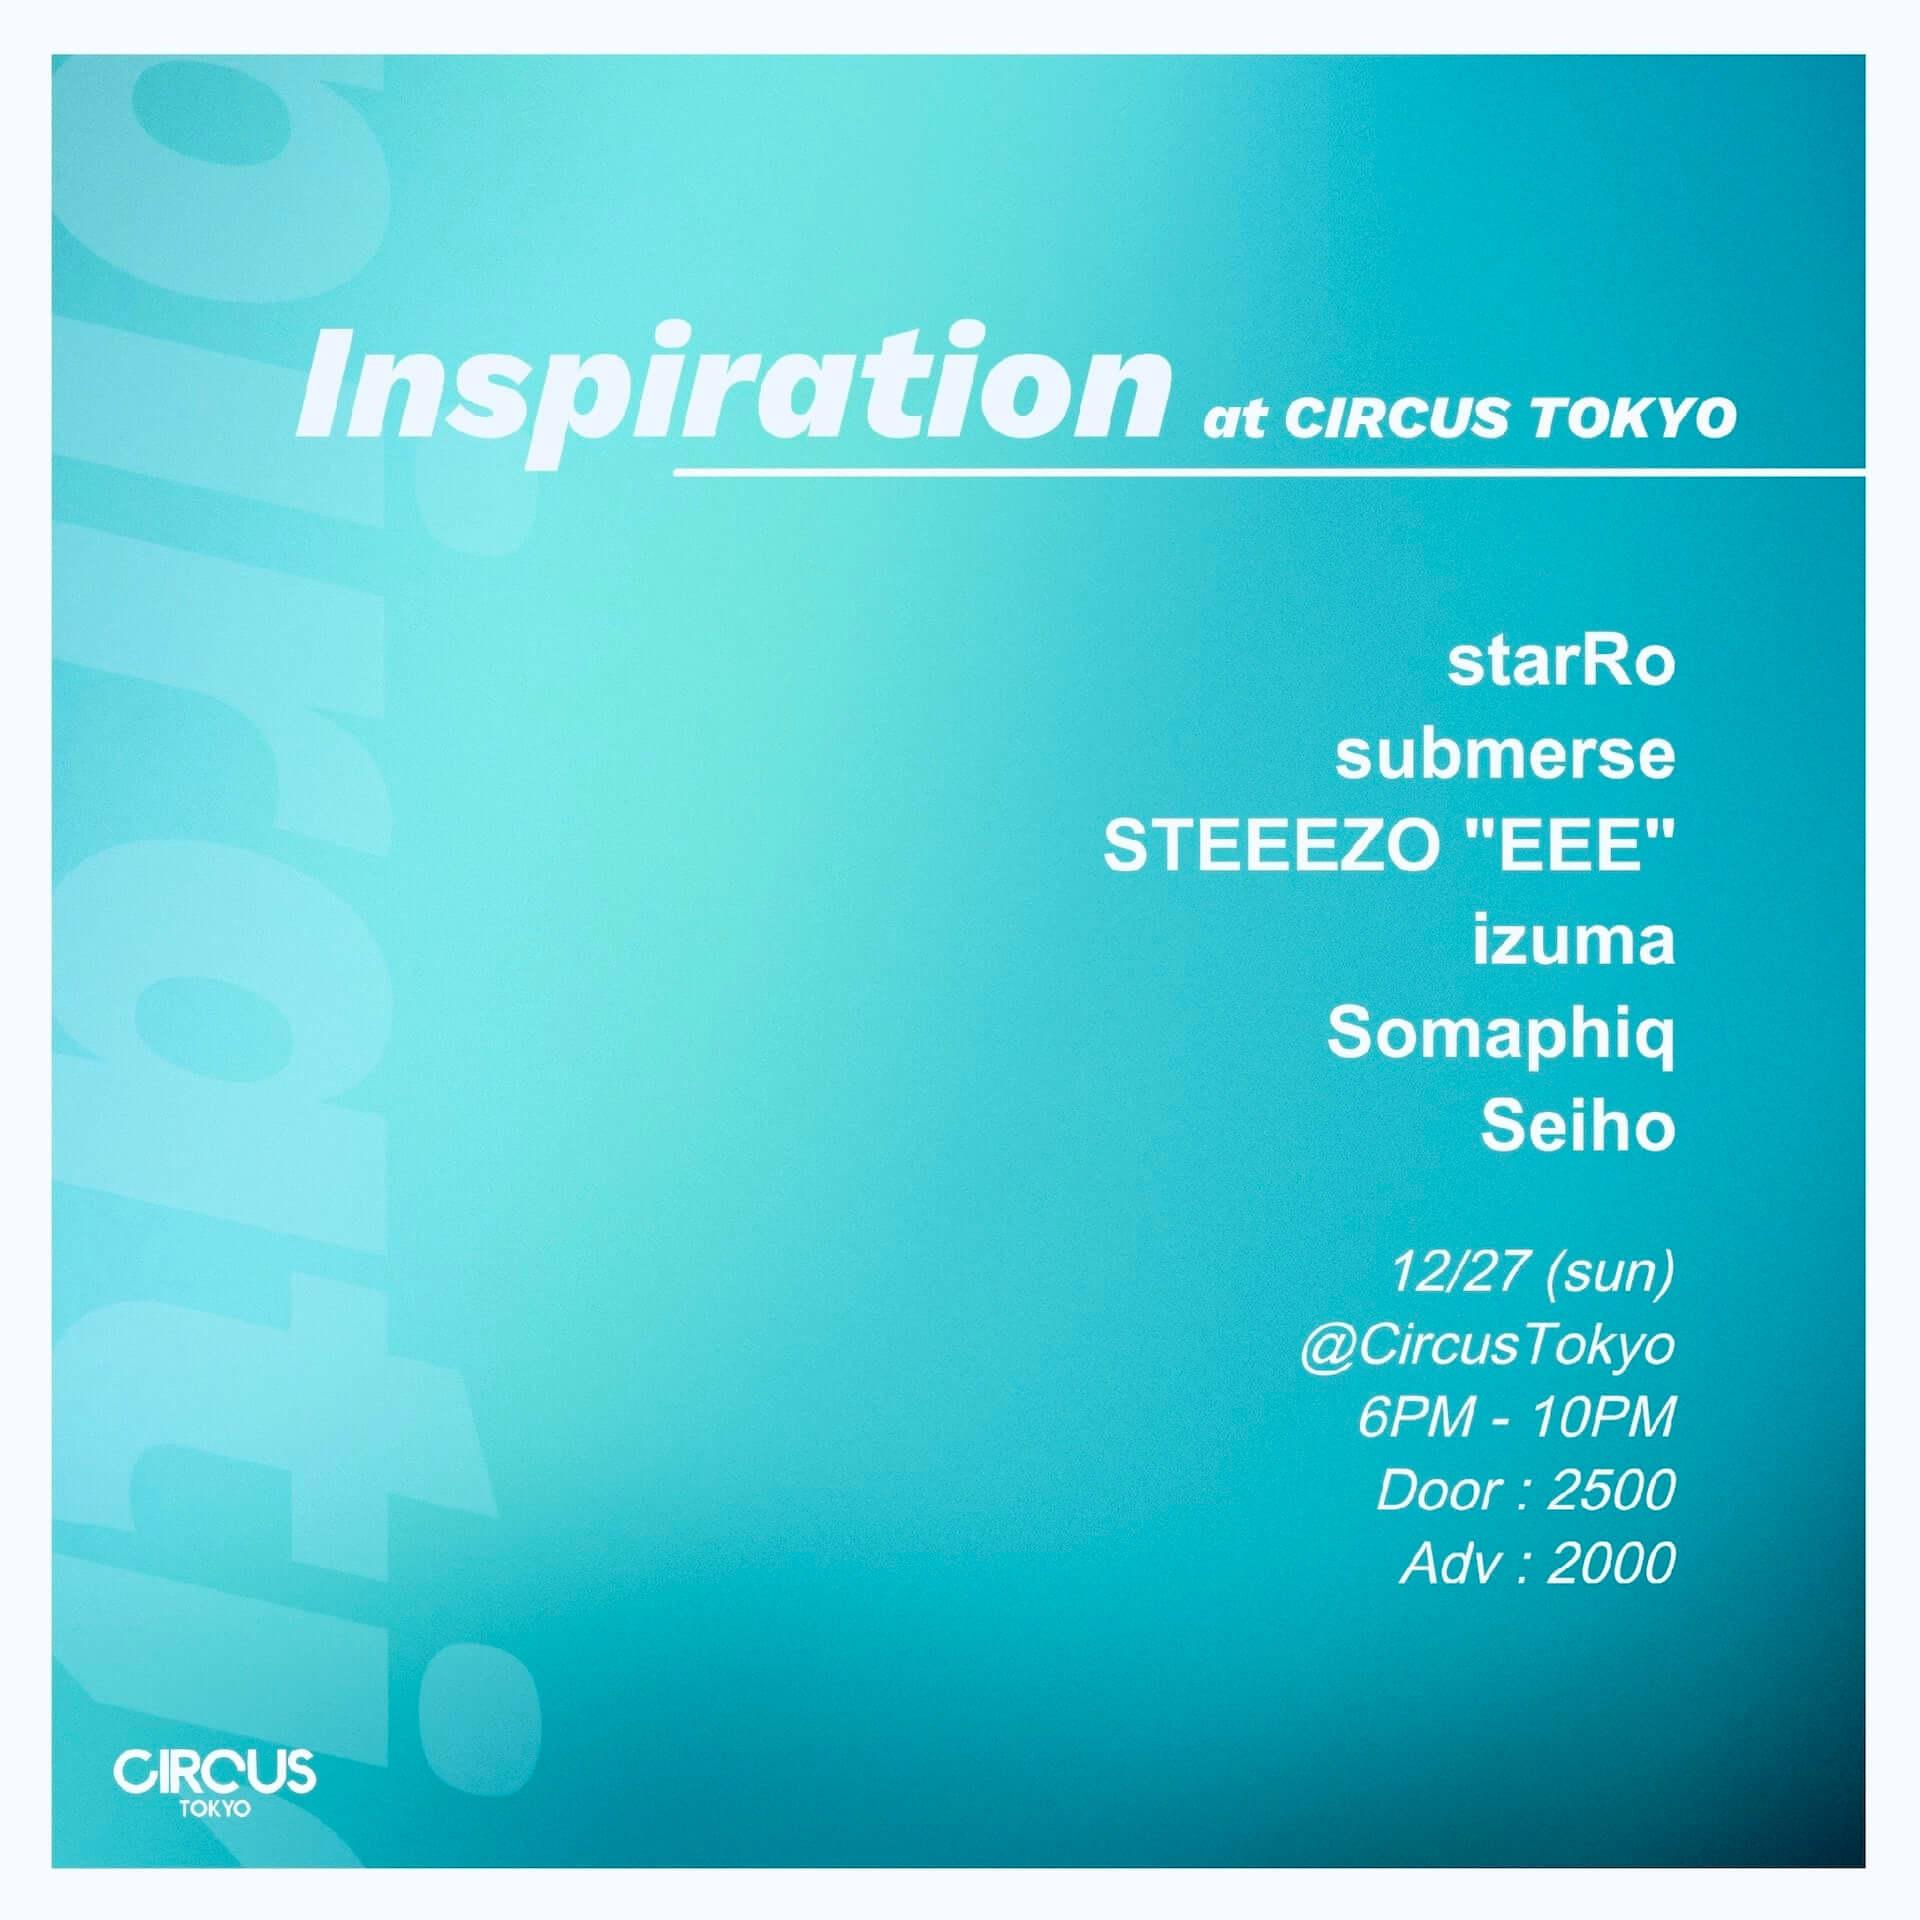 Seiho、starRo、submerseらが年末のCIRCUS TOKYOに登場!ビートメイカーライブイベント<Inspiration>第3弾が急遽開催決定 music201223_inspiration_1-1920x1920